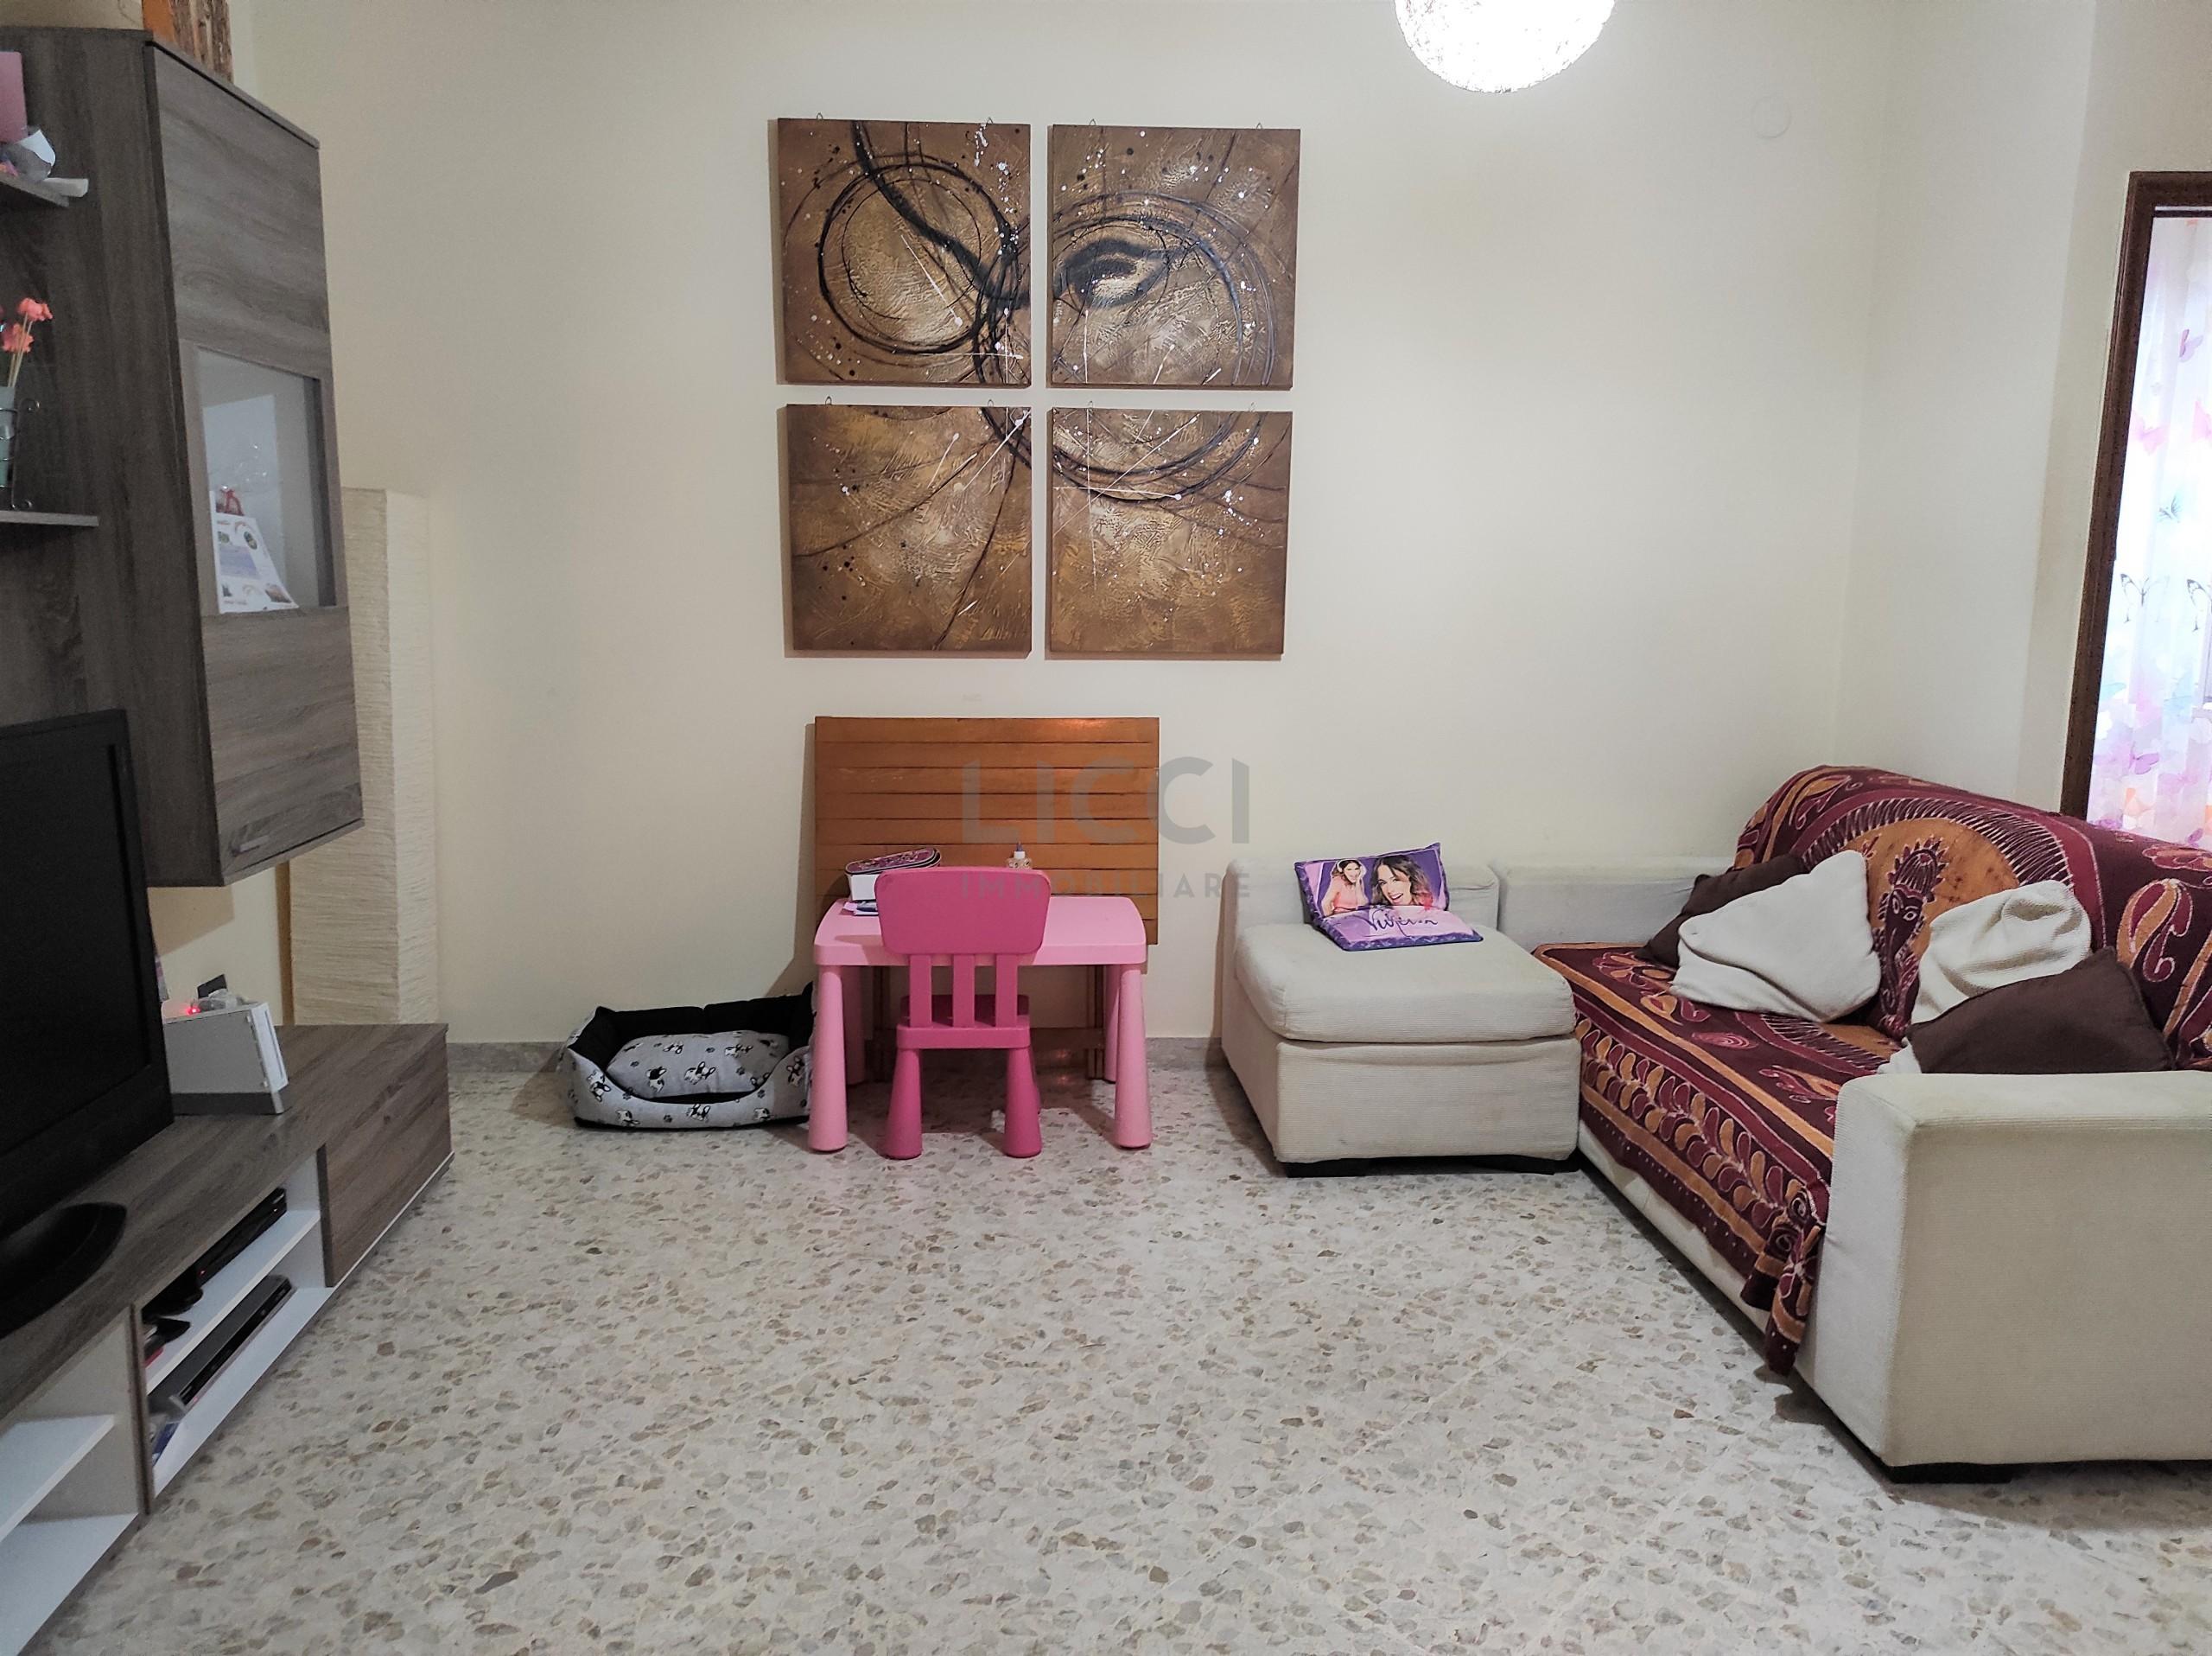 Appartamento a Monopoli Via Cimino 45, Centro Storico